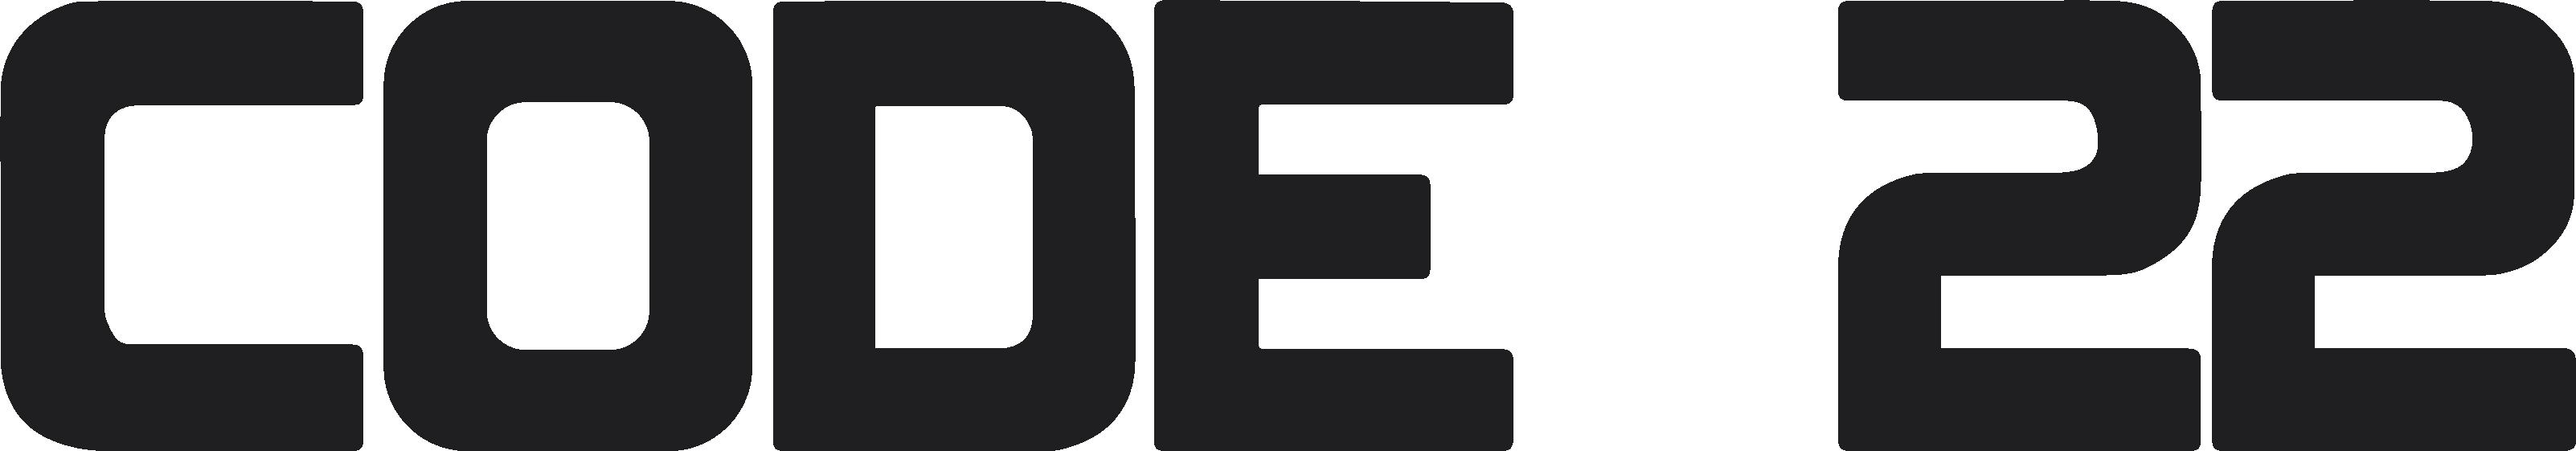 logotipo code22